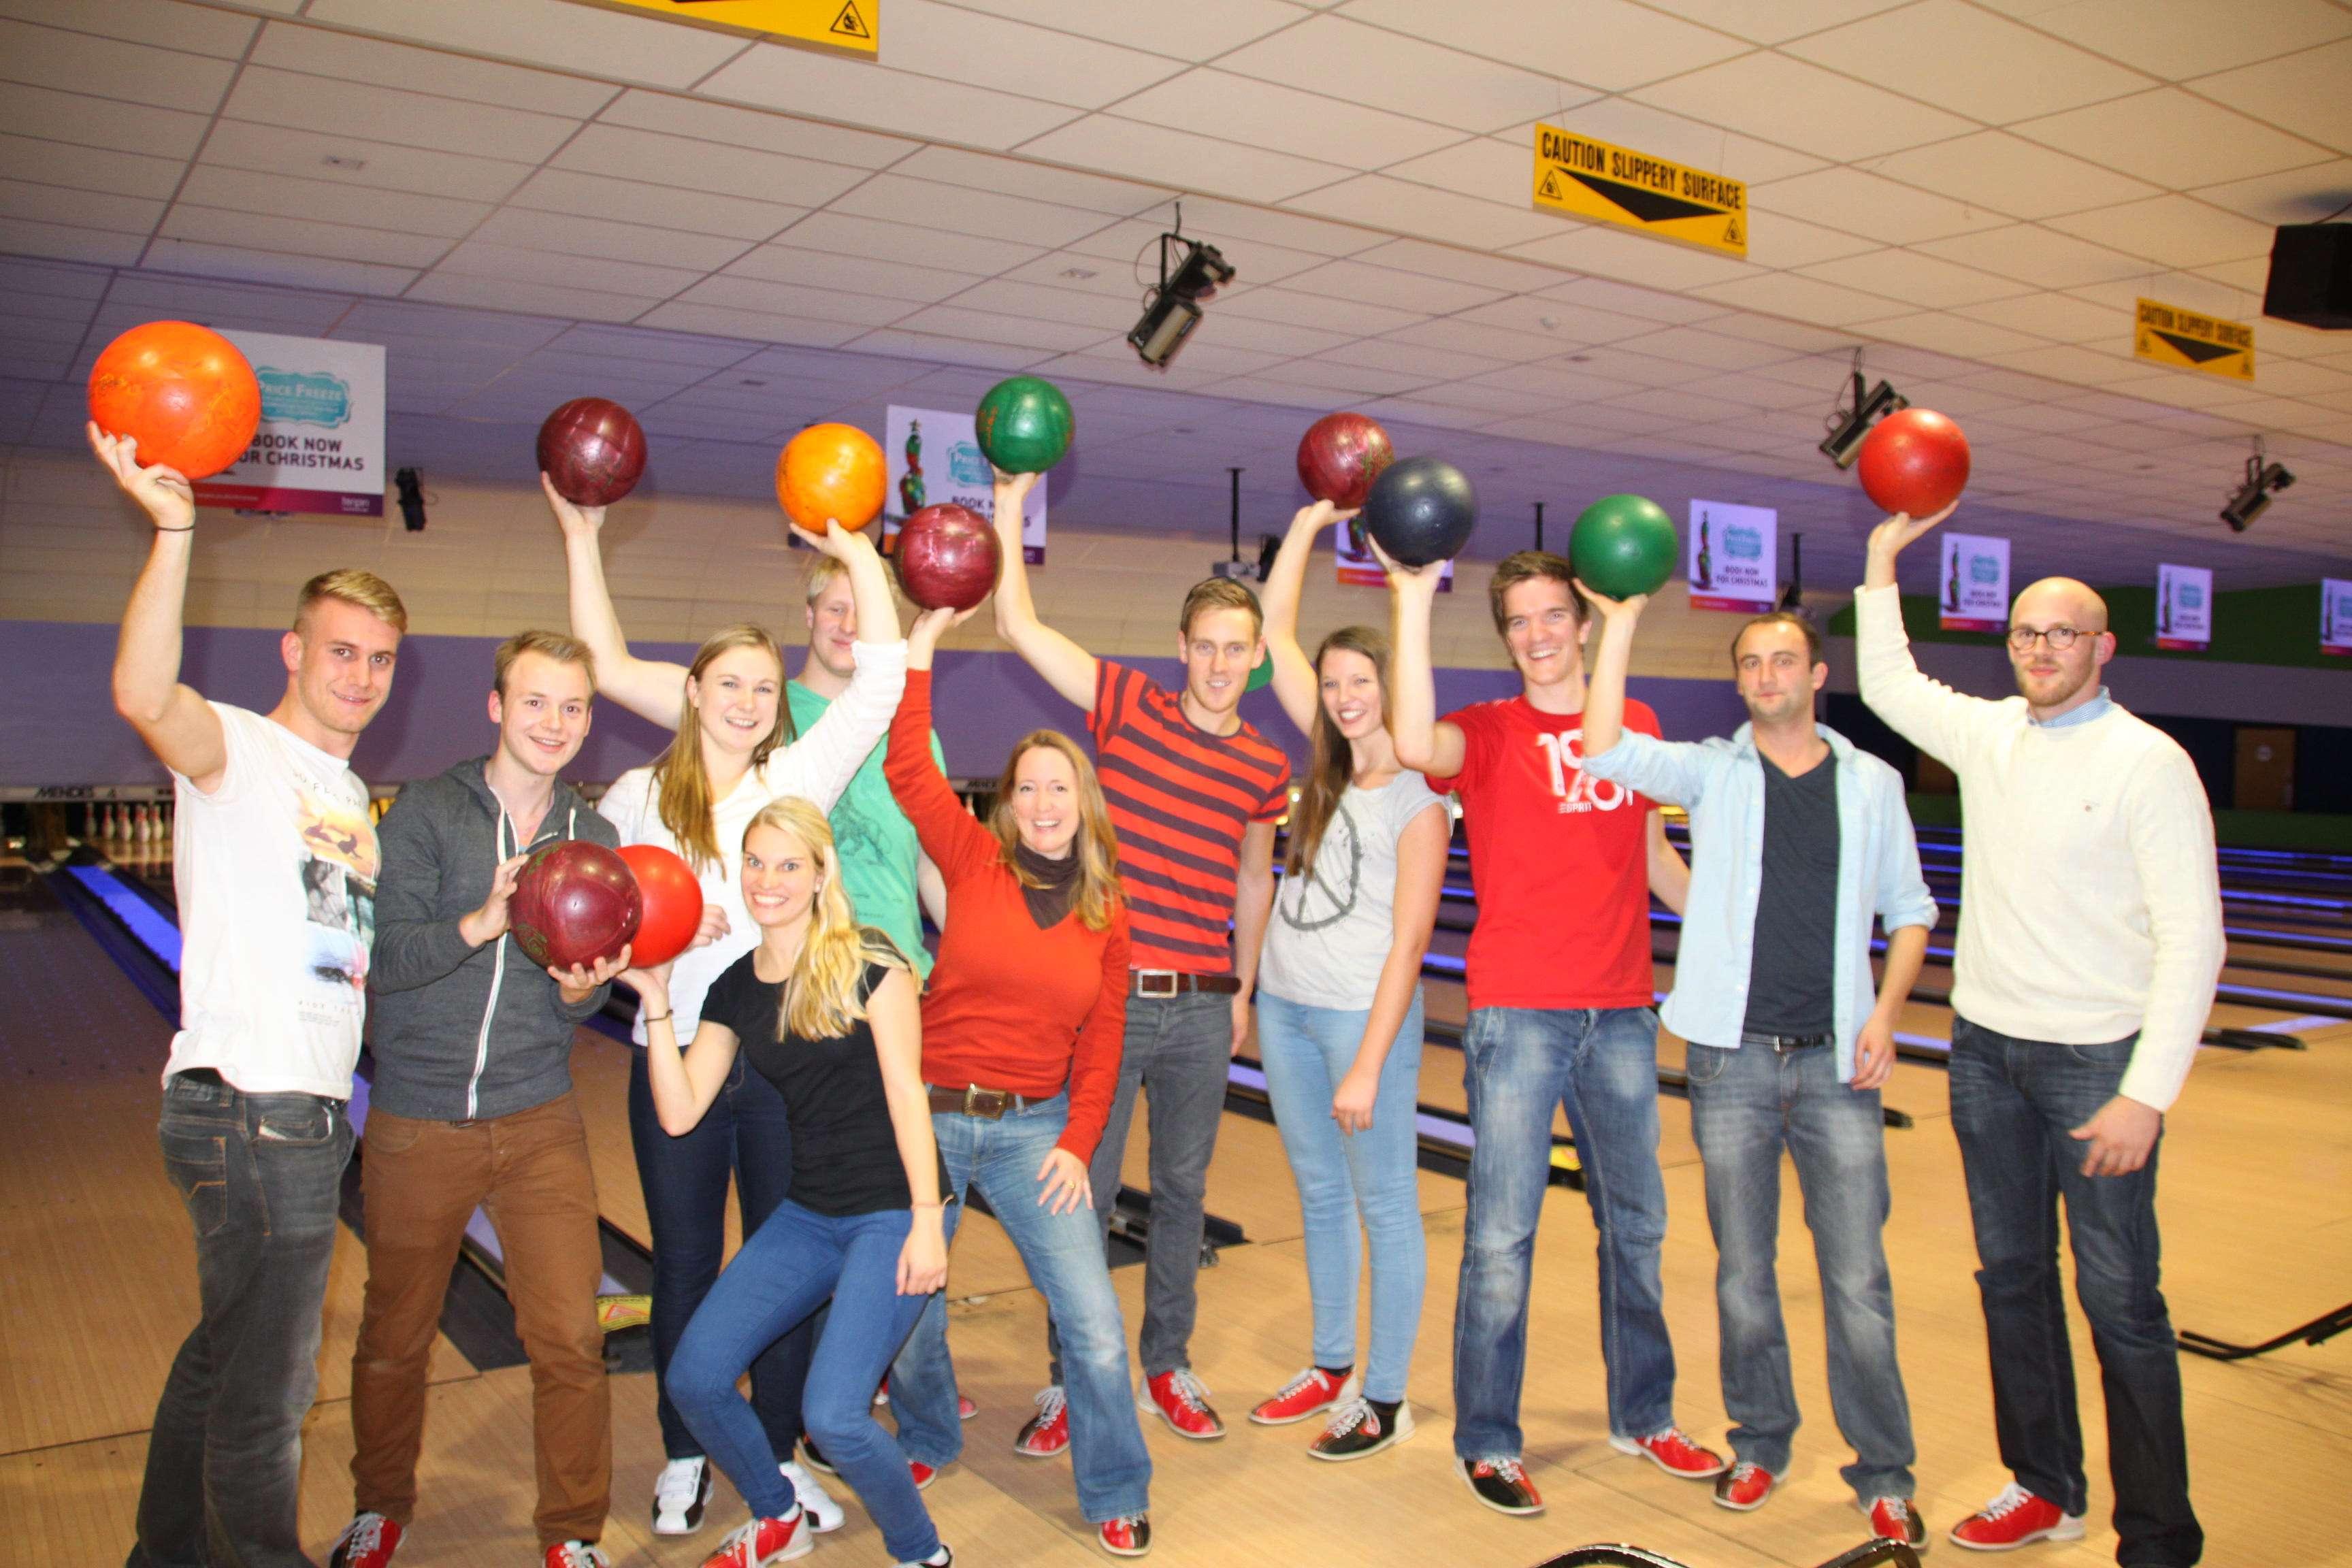 Sportlich am Abend: Bowling